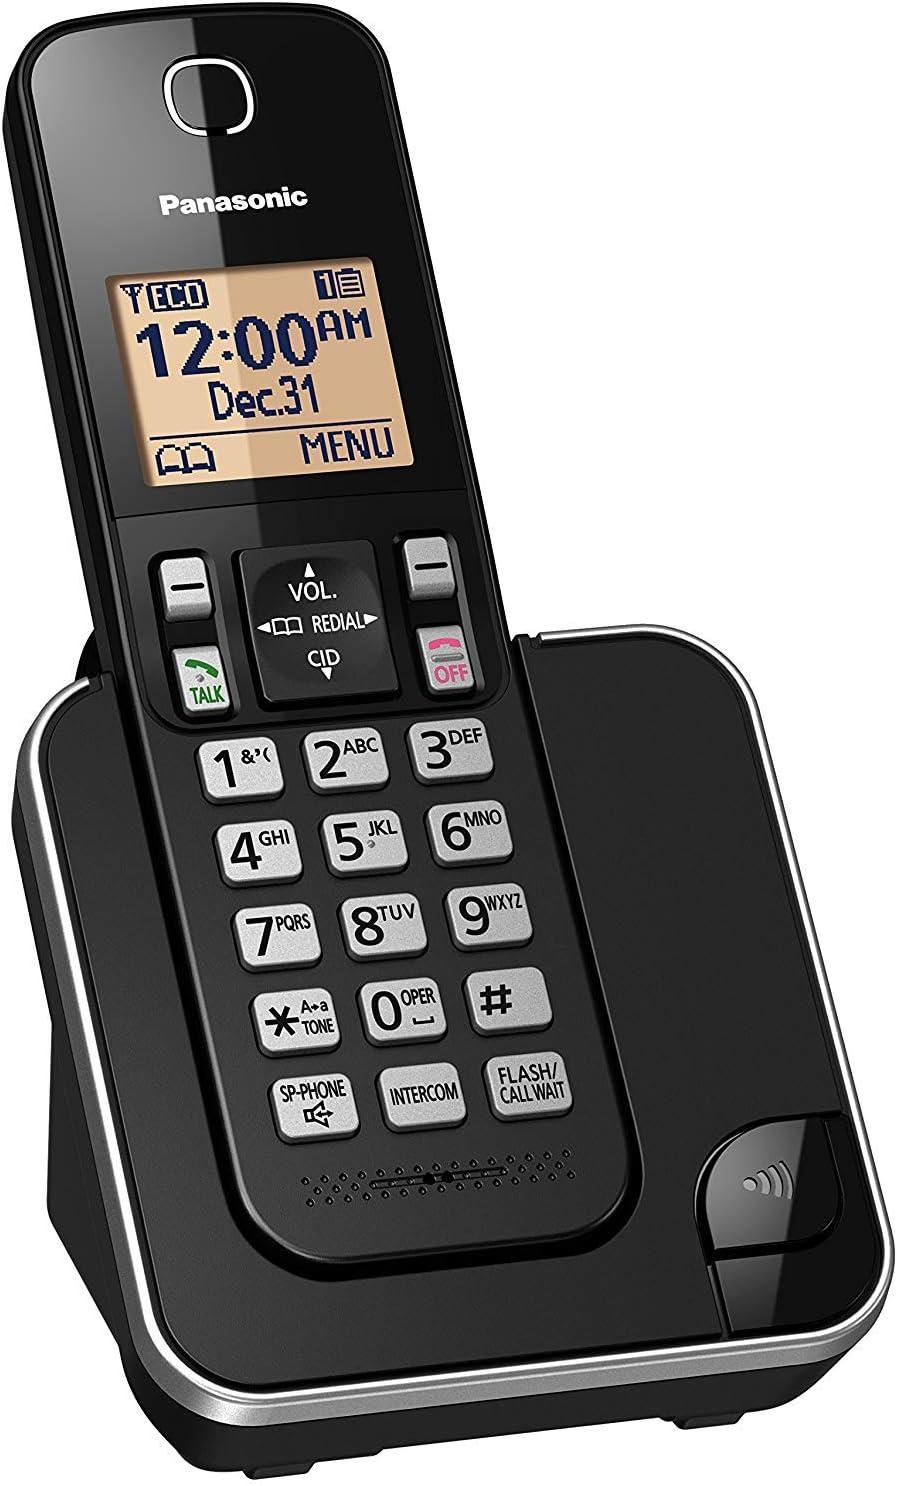 Panasonic KX-TGC363B / KX-TG633SK Dect 6.0 3 Teléfono Fijo de teléfono (reacondicionado Certificado) (KX-TGC362B +1): Amazon.es: Electrónica